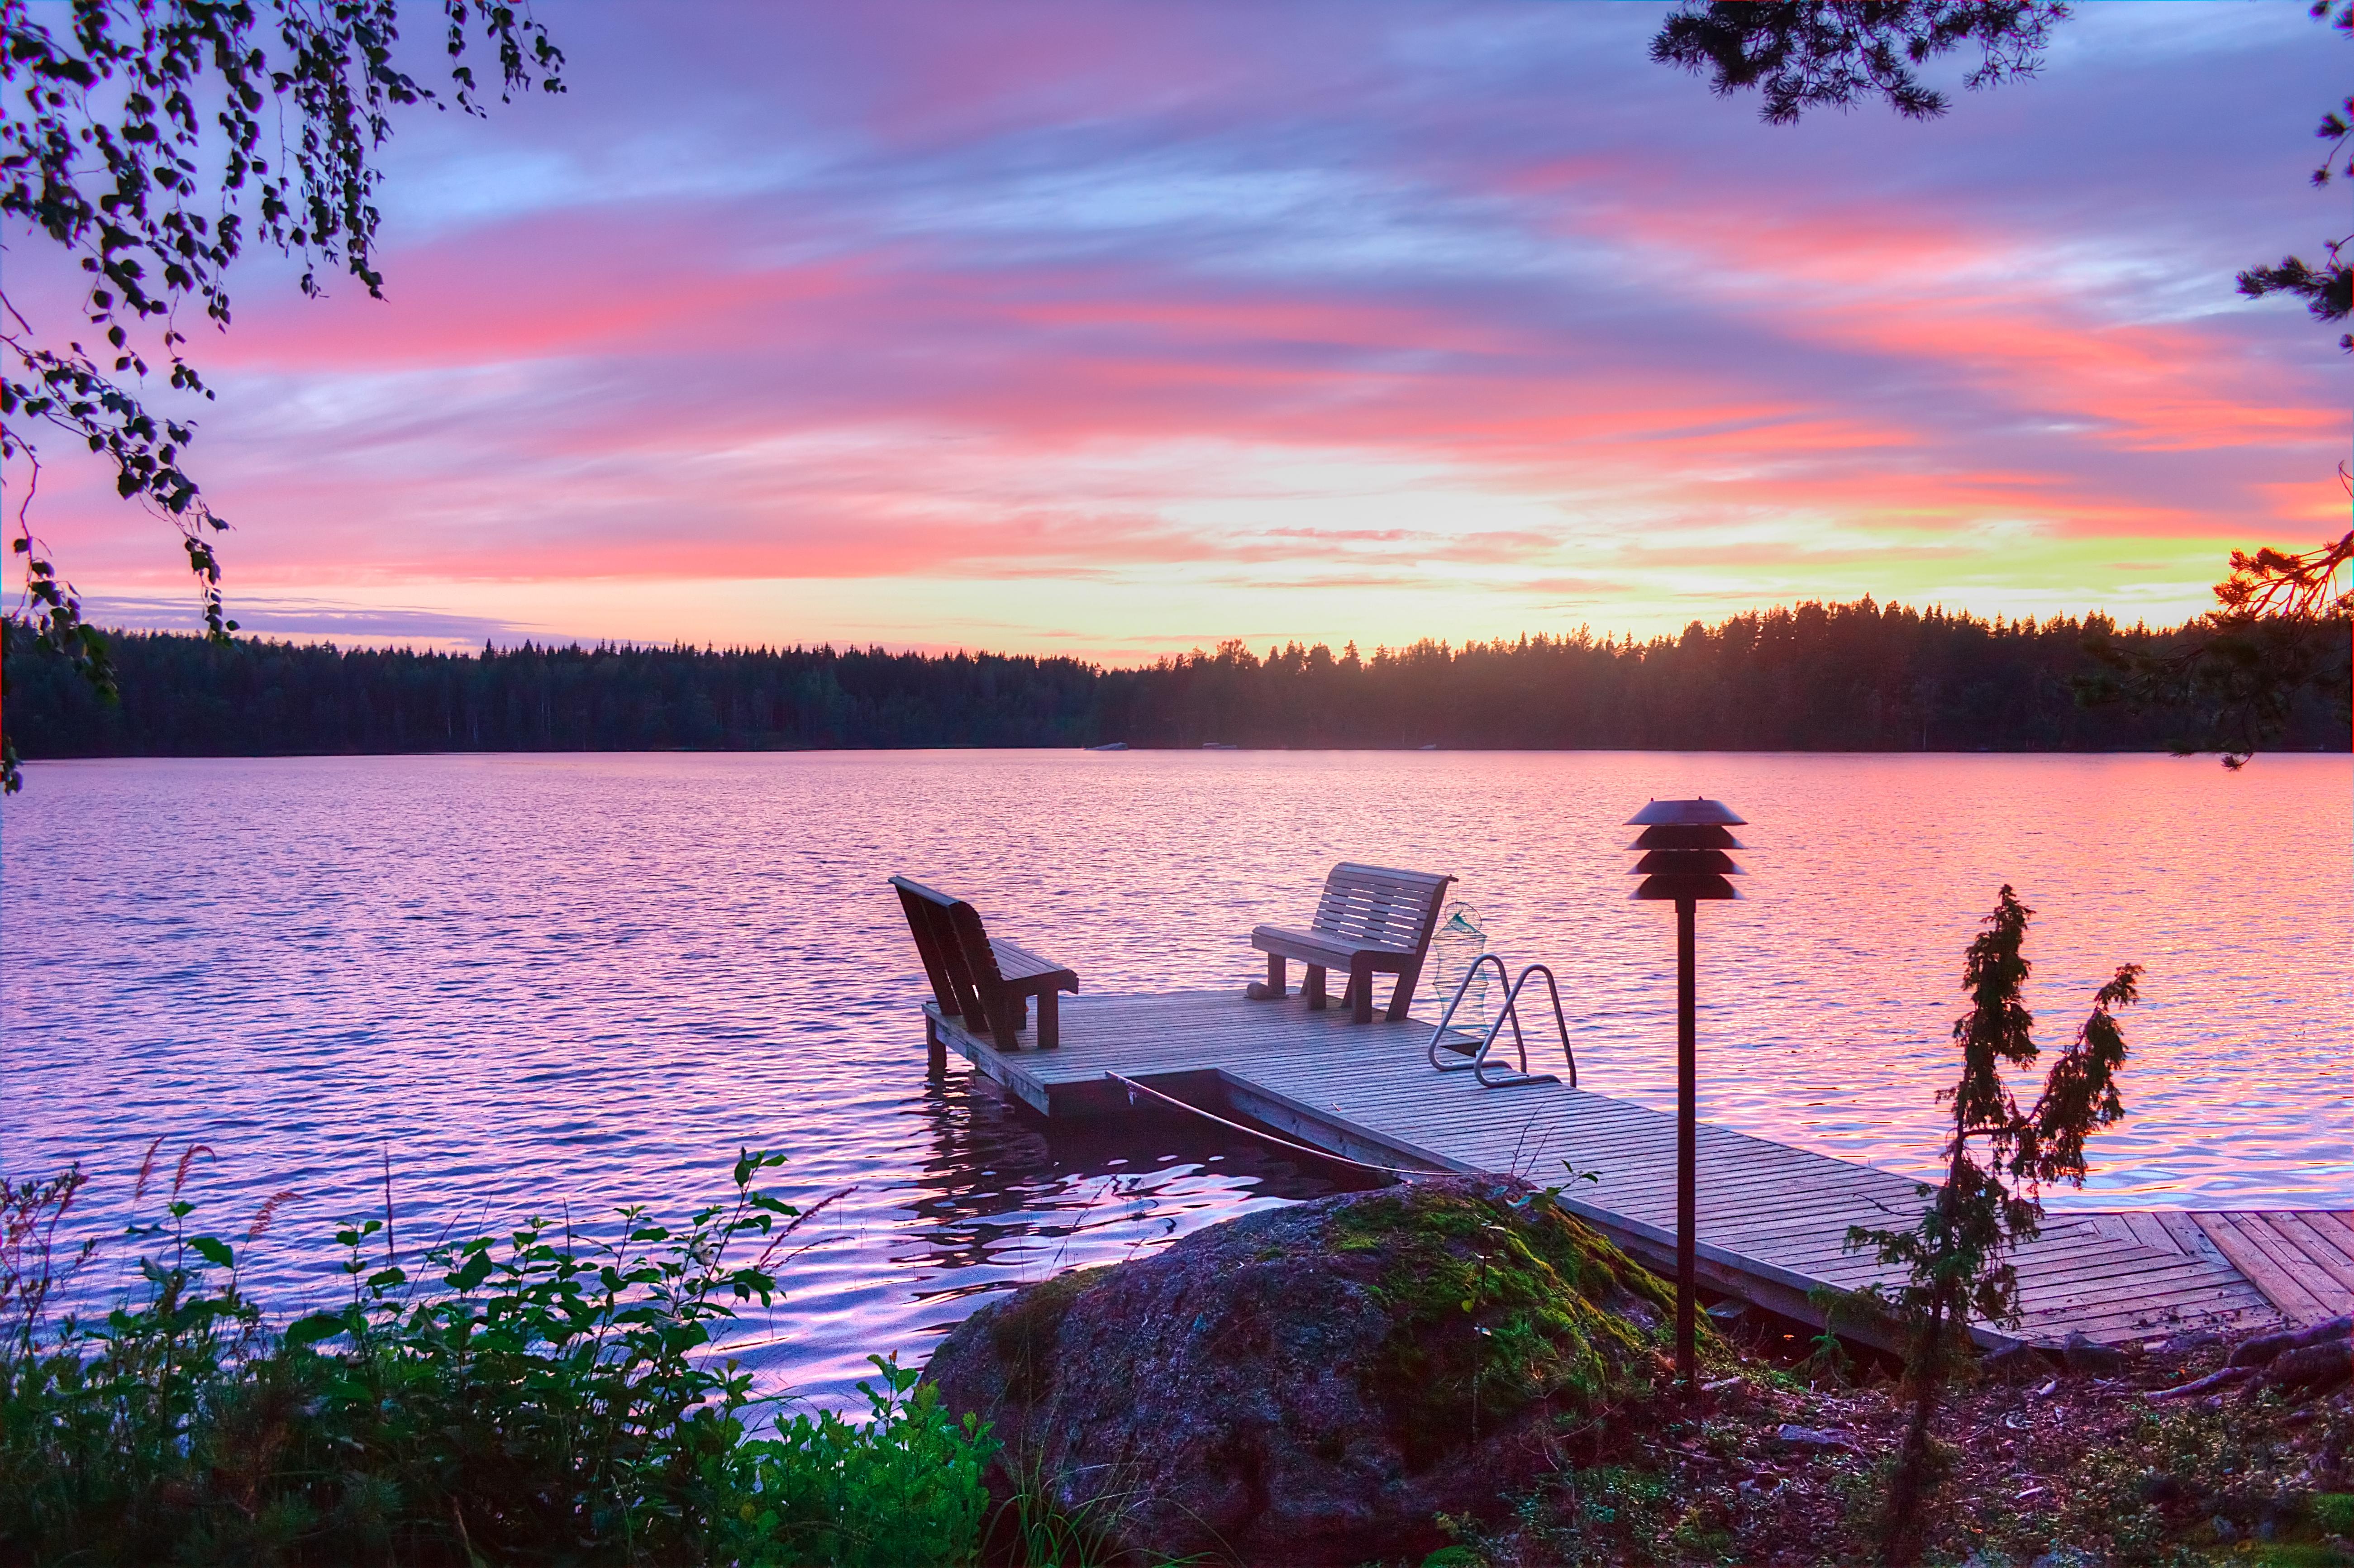 cw-1101-sunrise-on-lake-with-sitting-pier.jpg